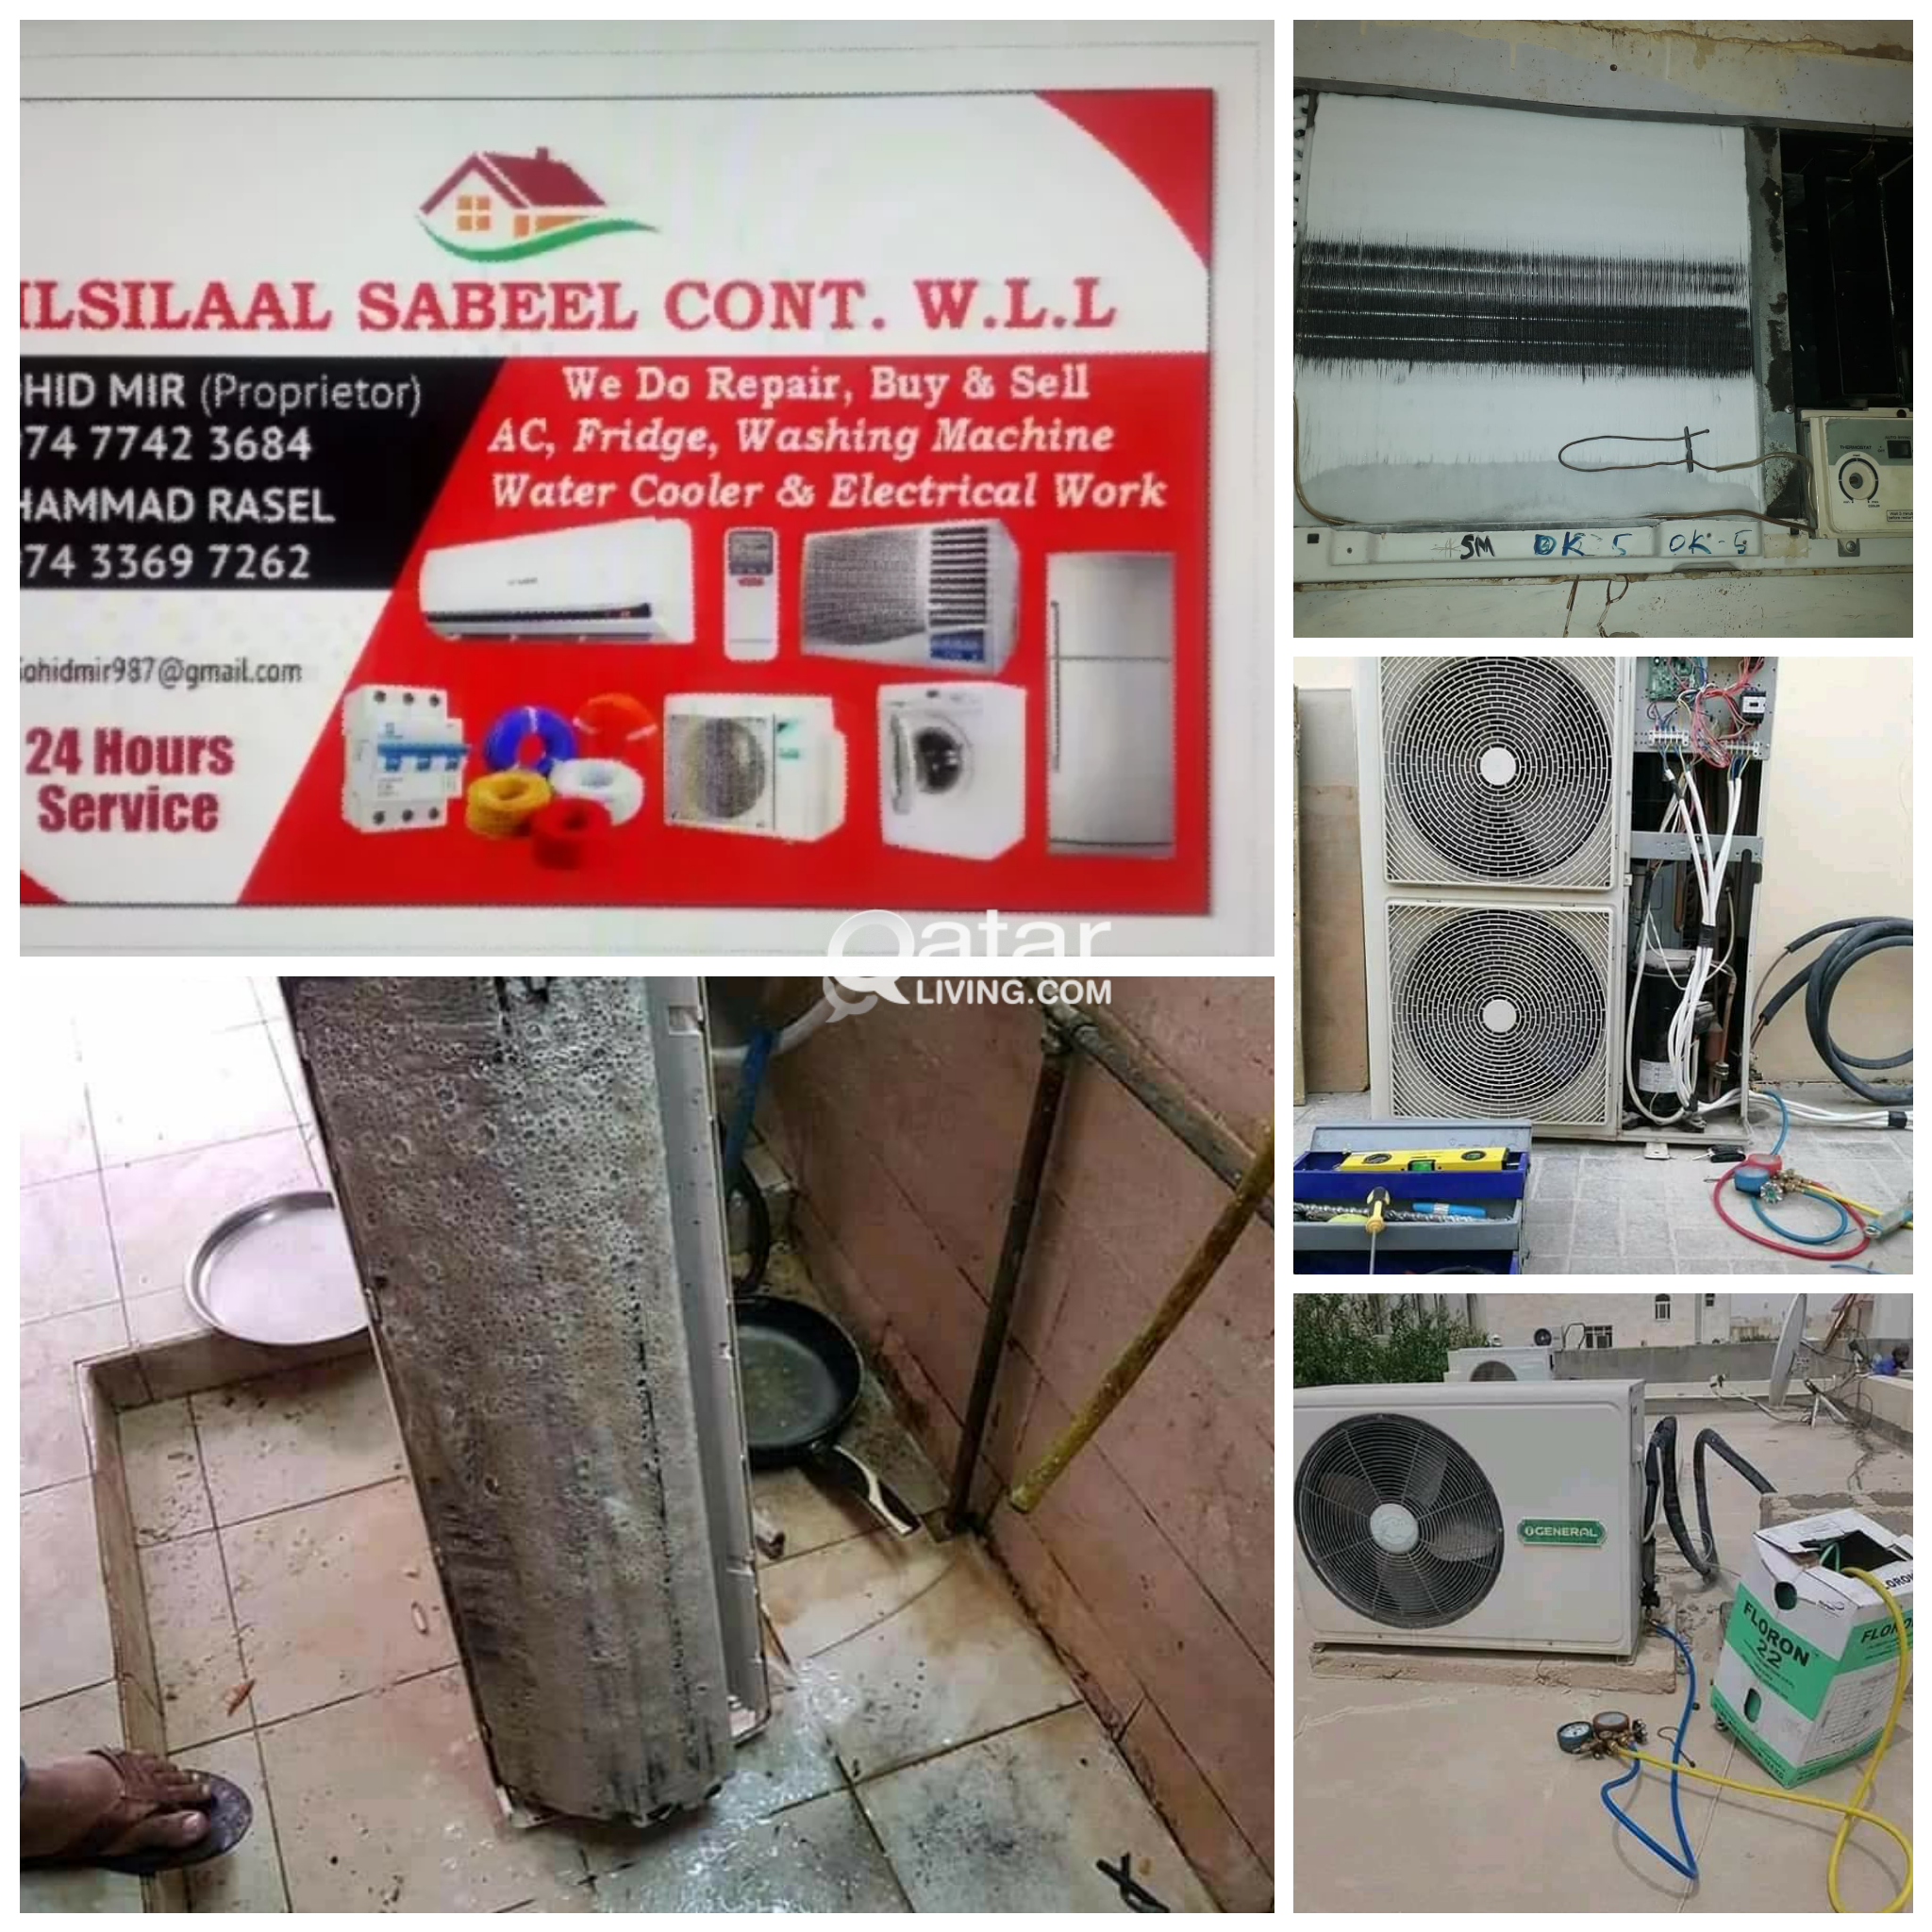 Split, Window AC servicing, repairing and all Elec